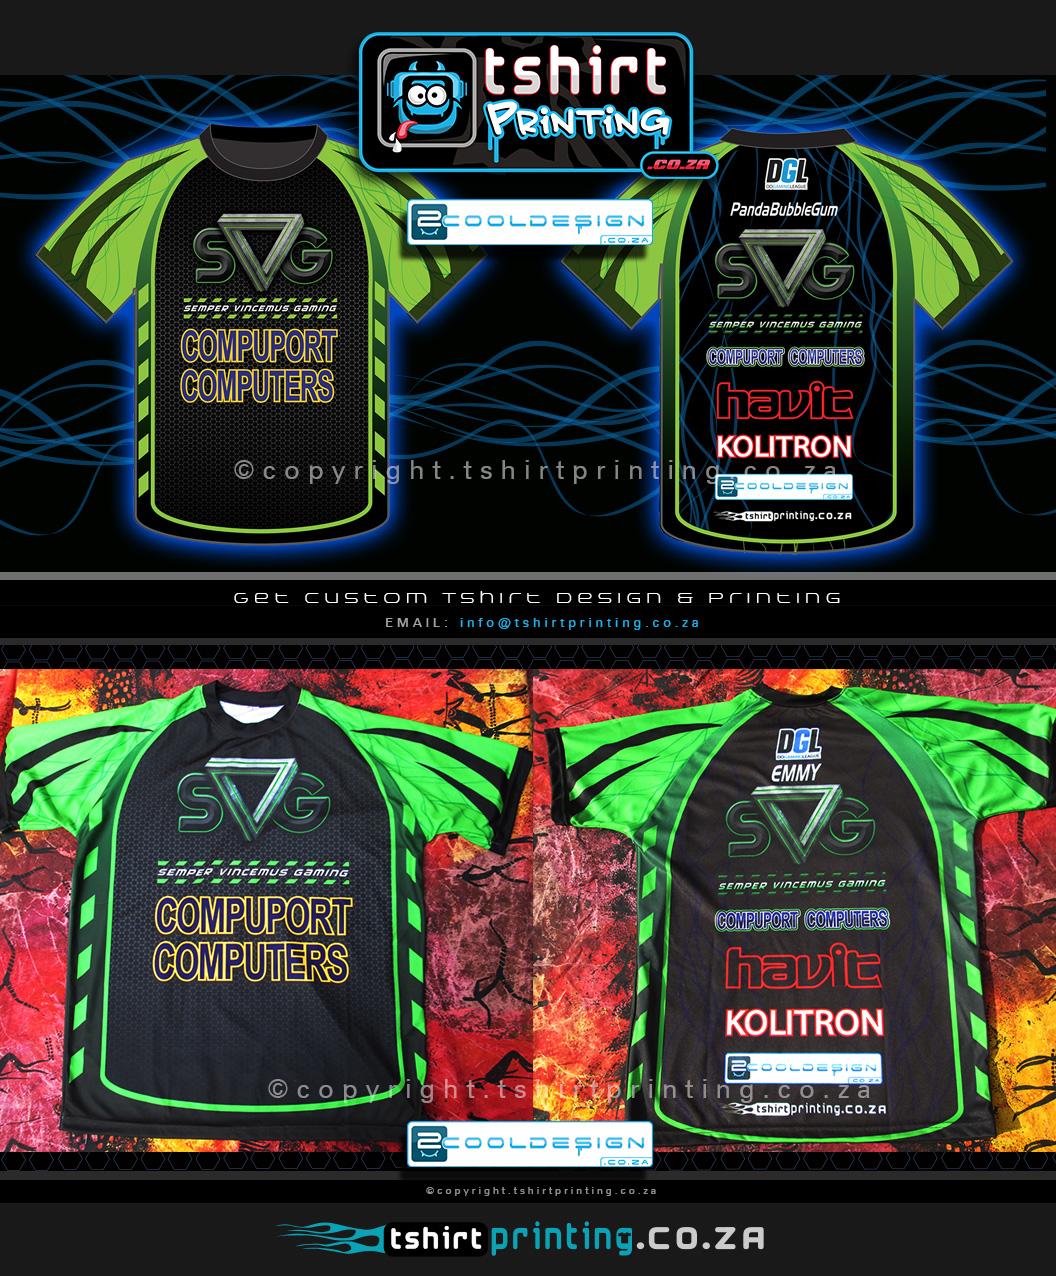 T shirt design za - Custom Shirt Printing And Design By Tshirt Printing